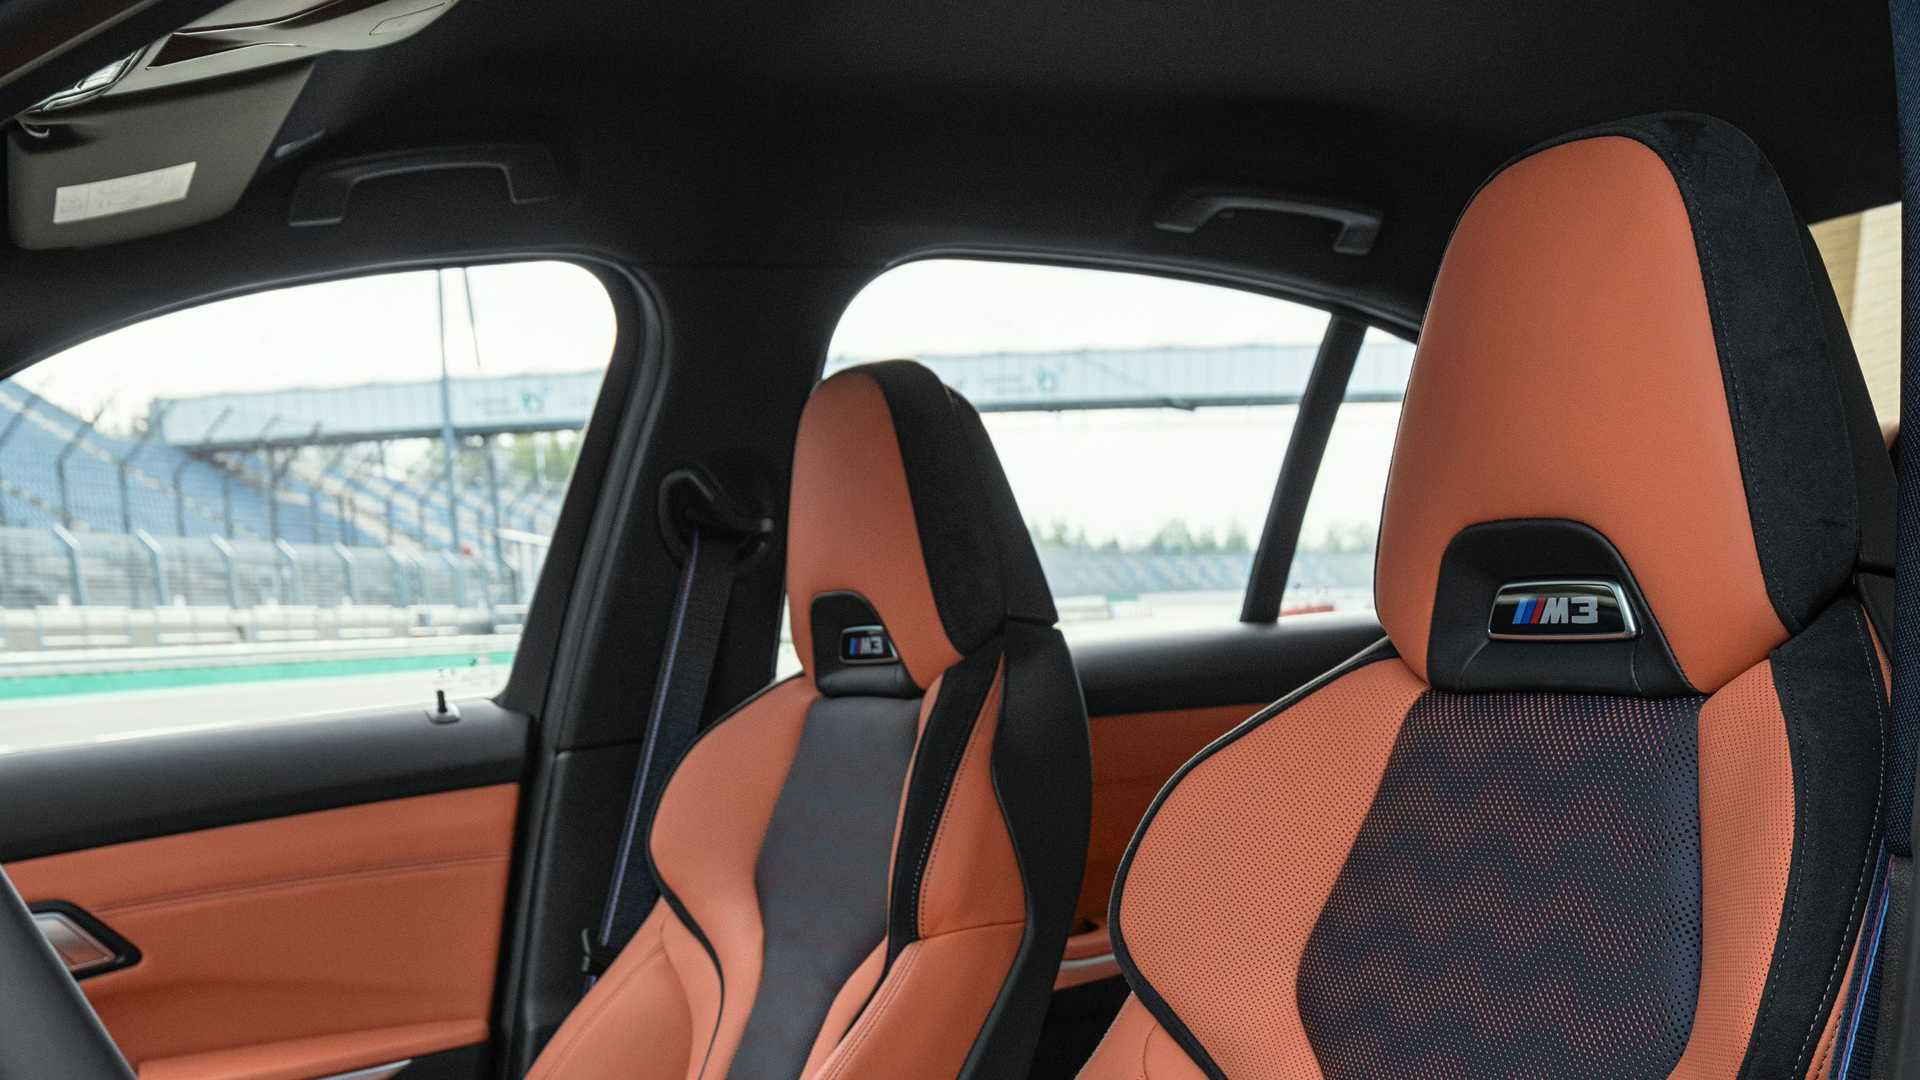 2021-bmw-m3-interior (1)